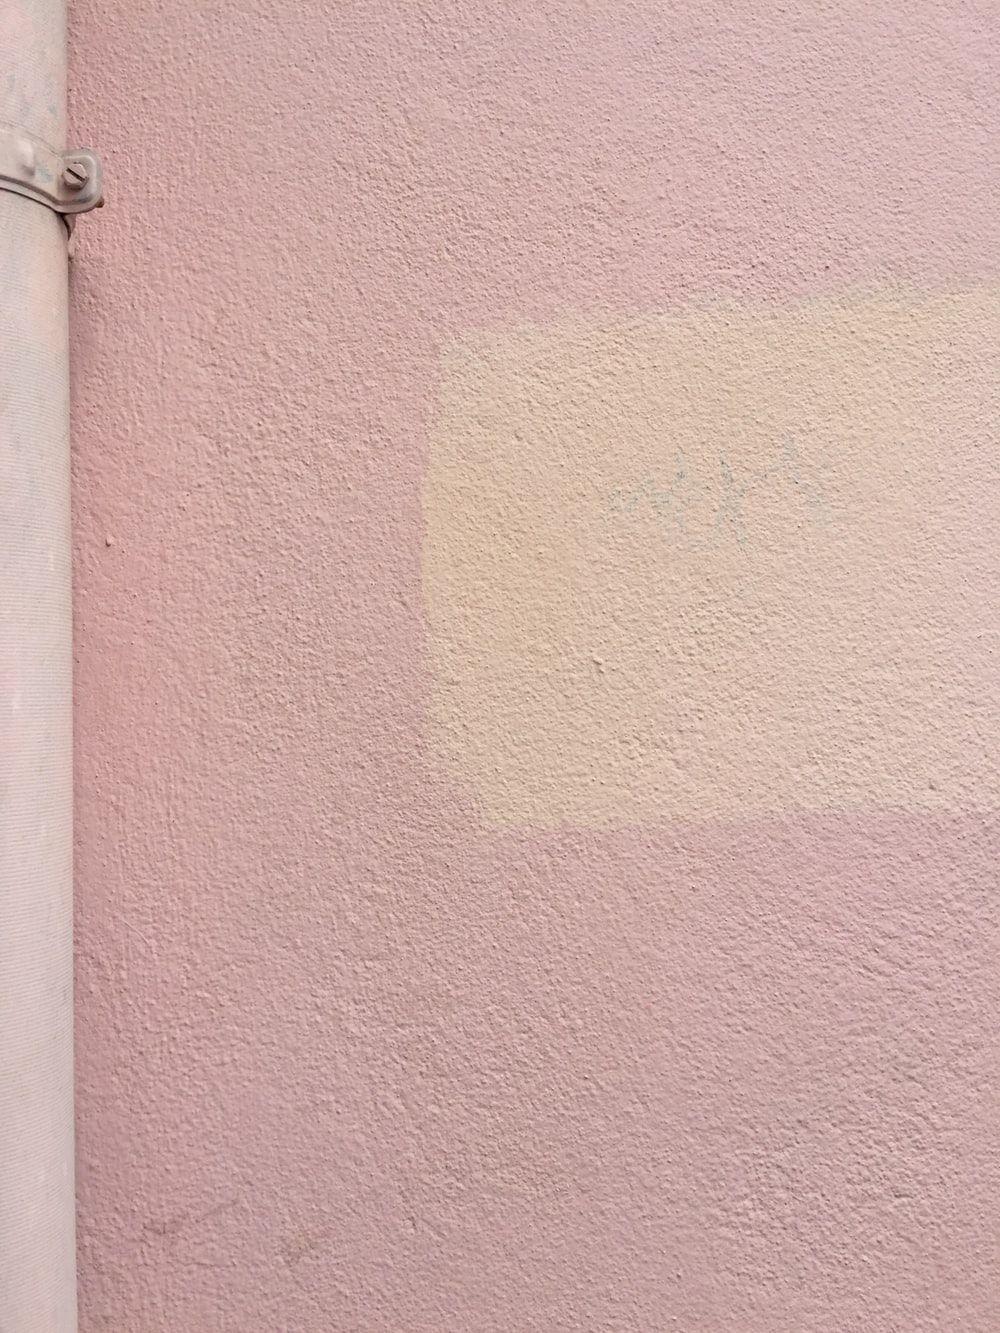 Wallpaper Warna Polos : wallpaper, warna, polos, Gambar, Background, Warna, Hitam, Polos, Https://ift.tt/32YzFsH, Gambar,, Polos,